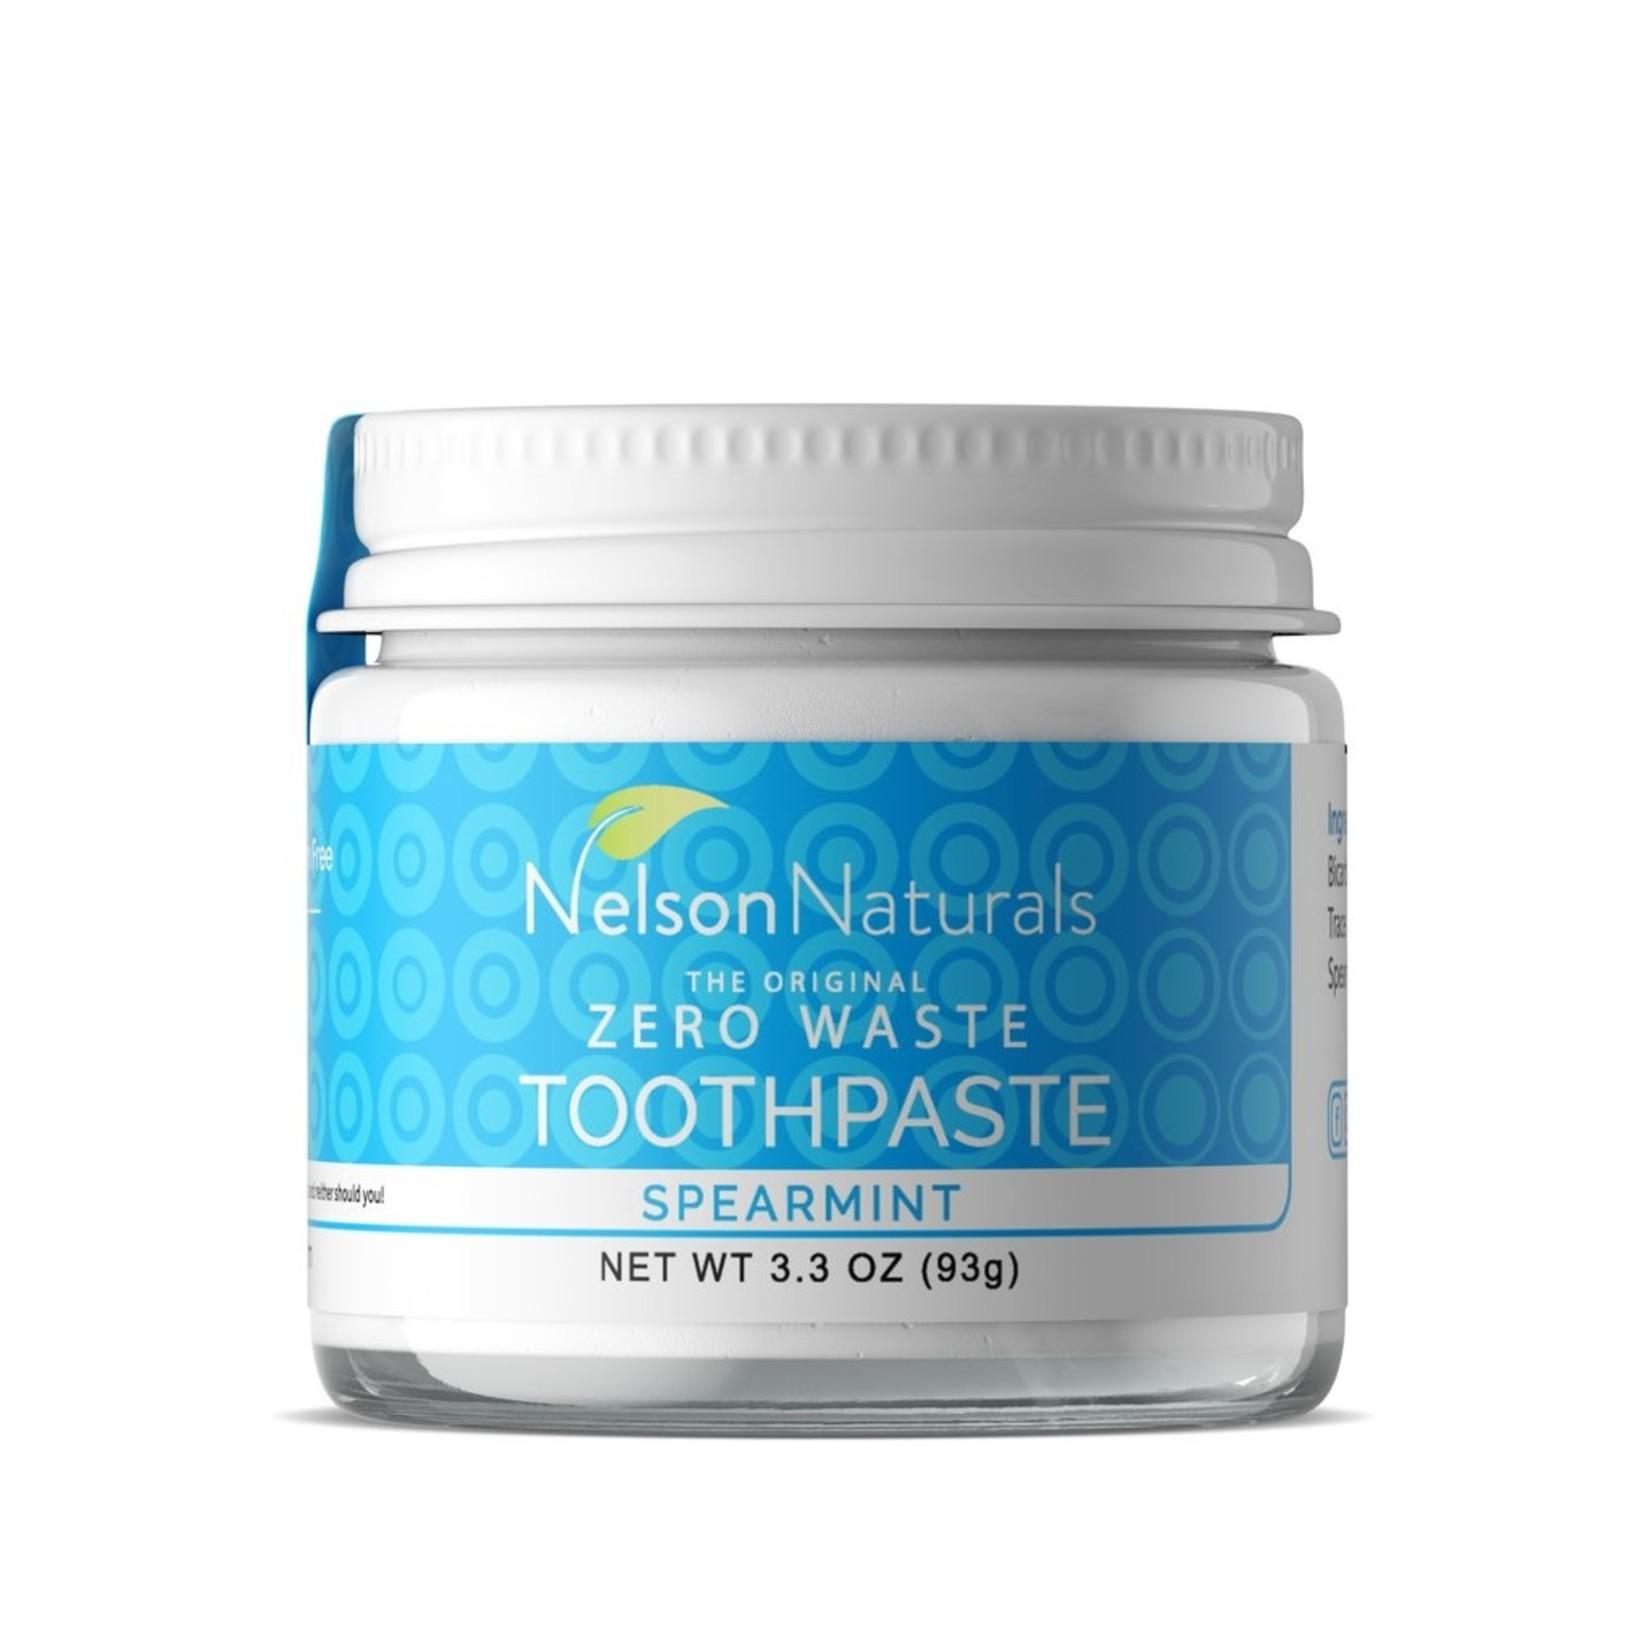 NELSON NATURALS TOOTHPASTE JAR - SPEARMINT